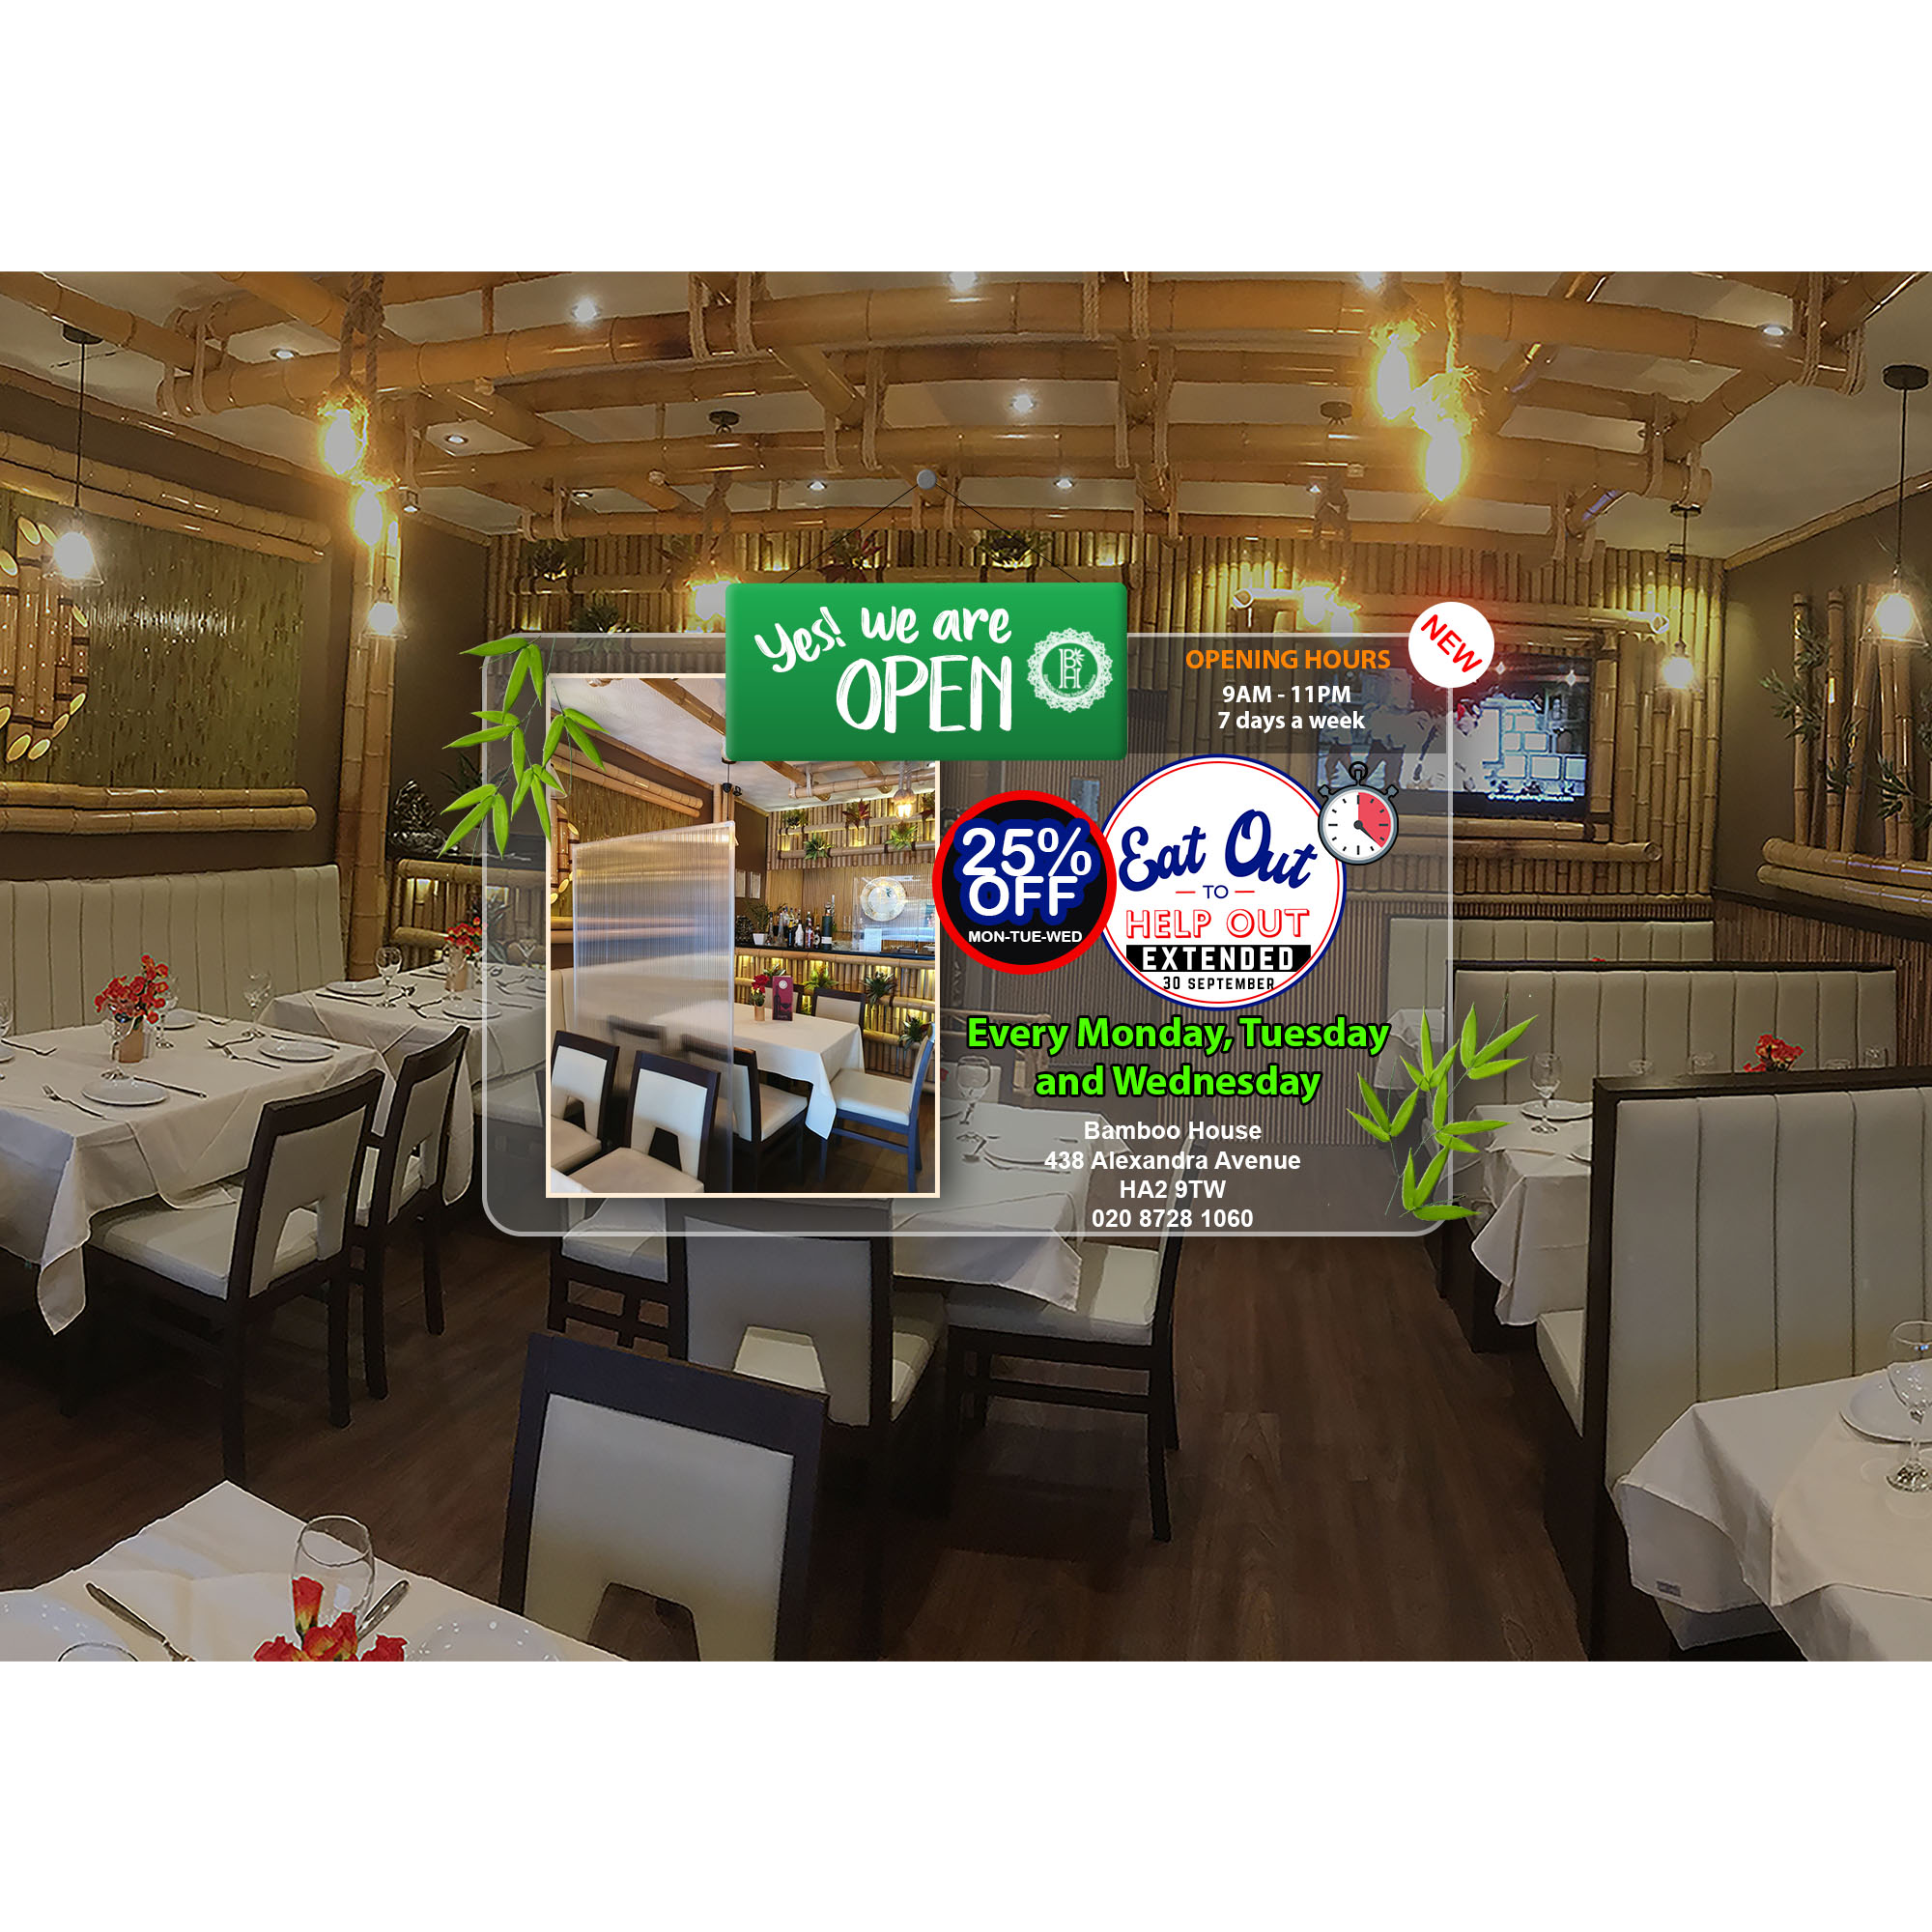 Bamboo House | A Luxurious Indian Restaurant in Harrow